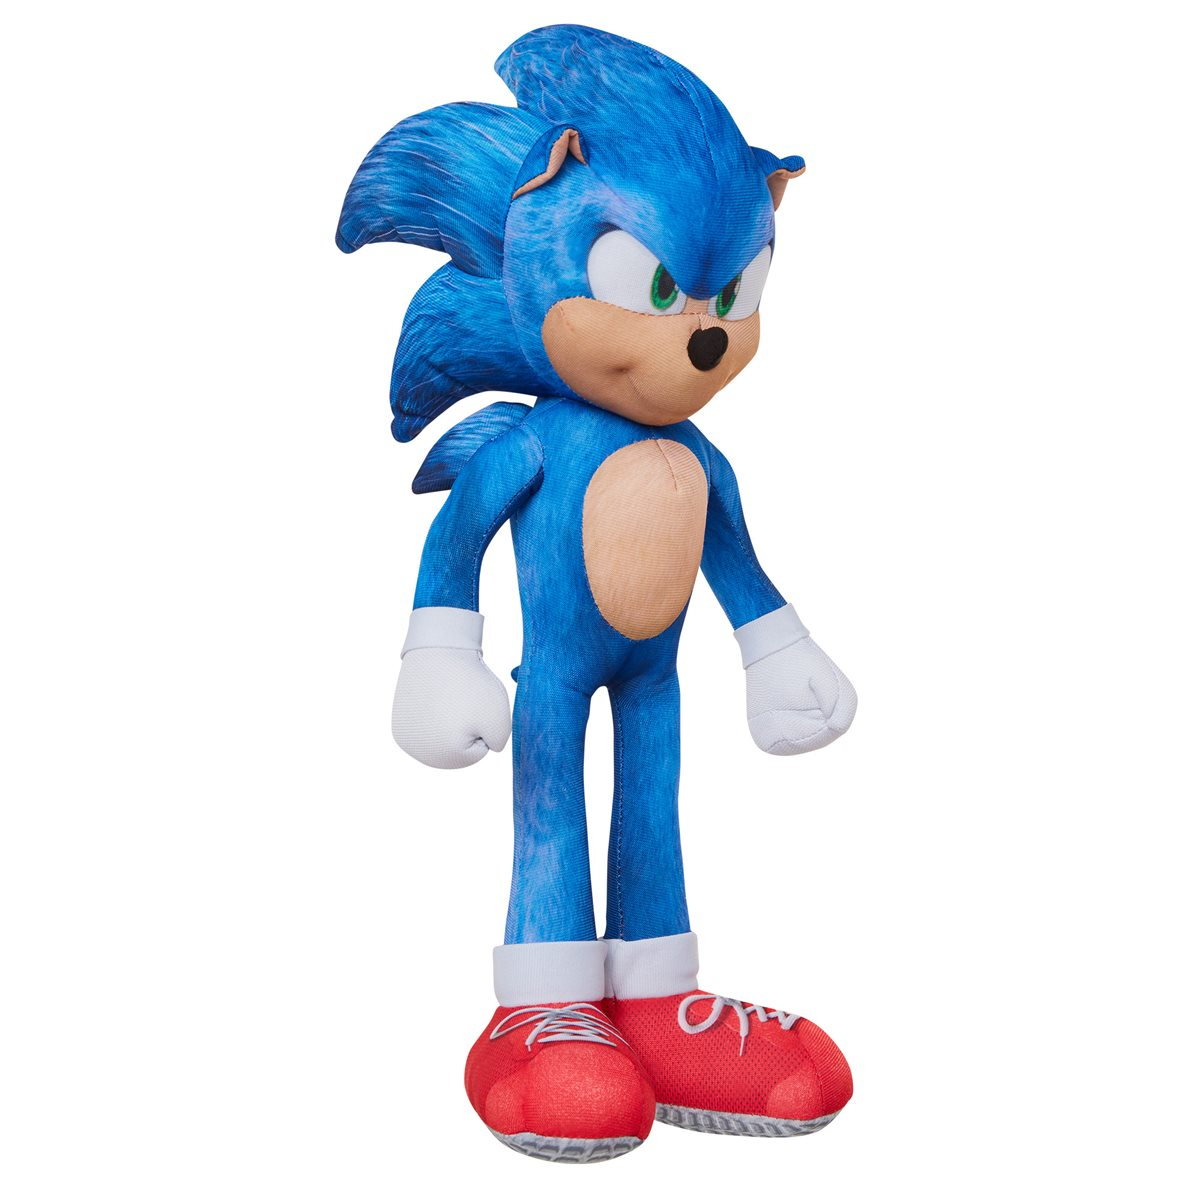 Sonic The Hedgehog Movie Sonic Talking 13 Inch Plush Entertainment Earth